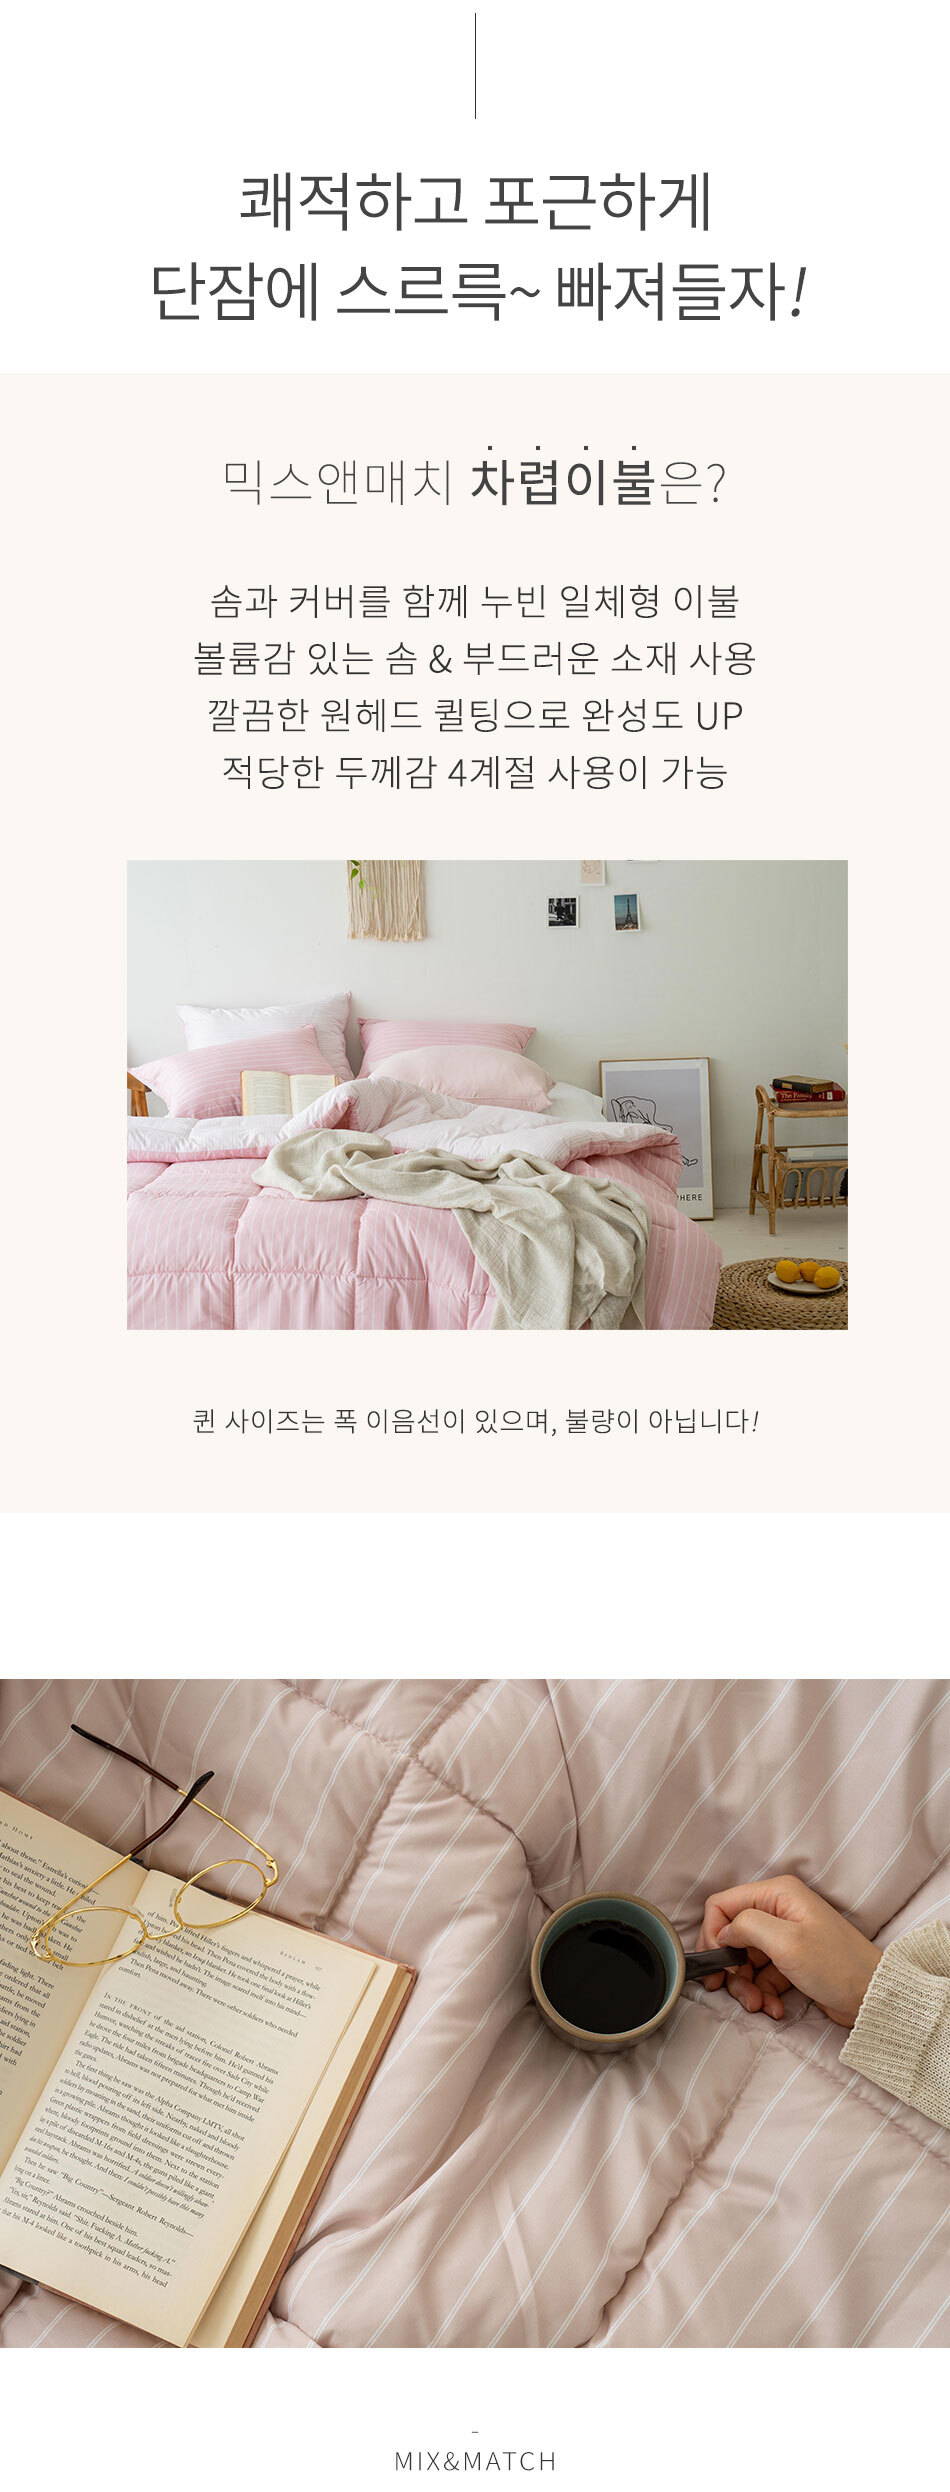 urban_bed_04.jpg